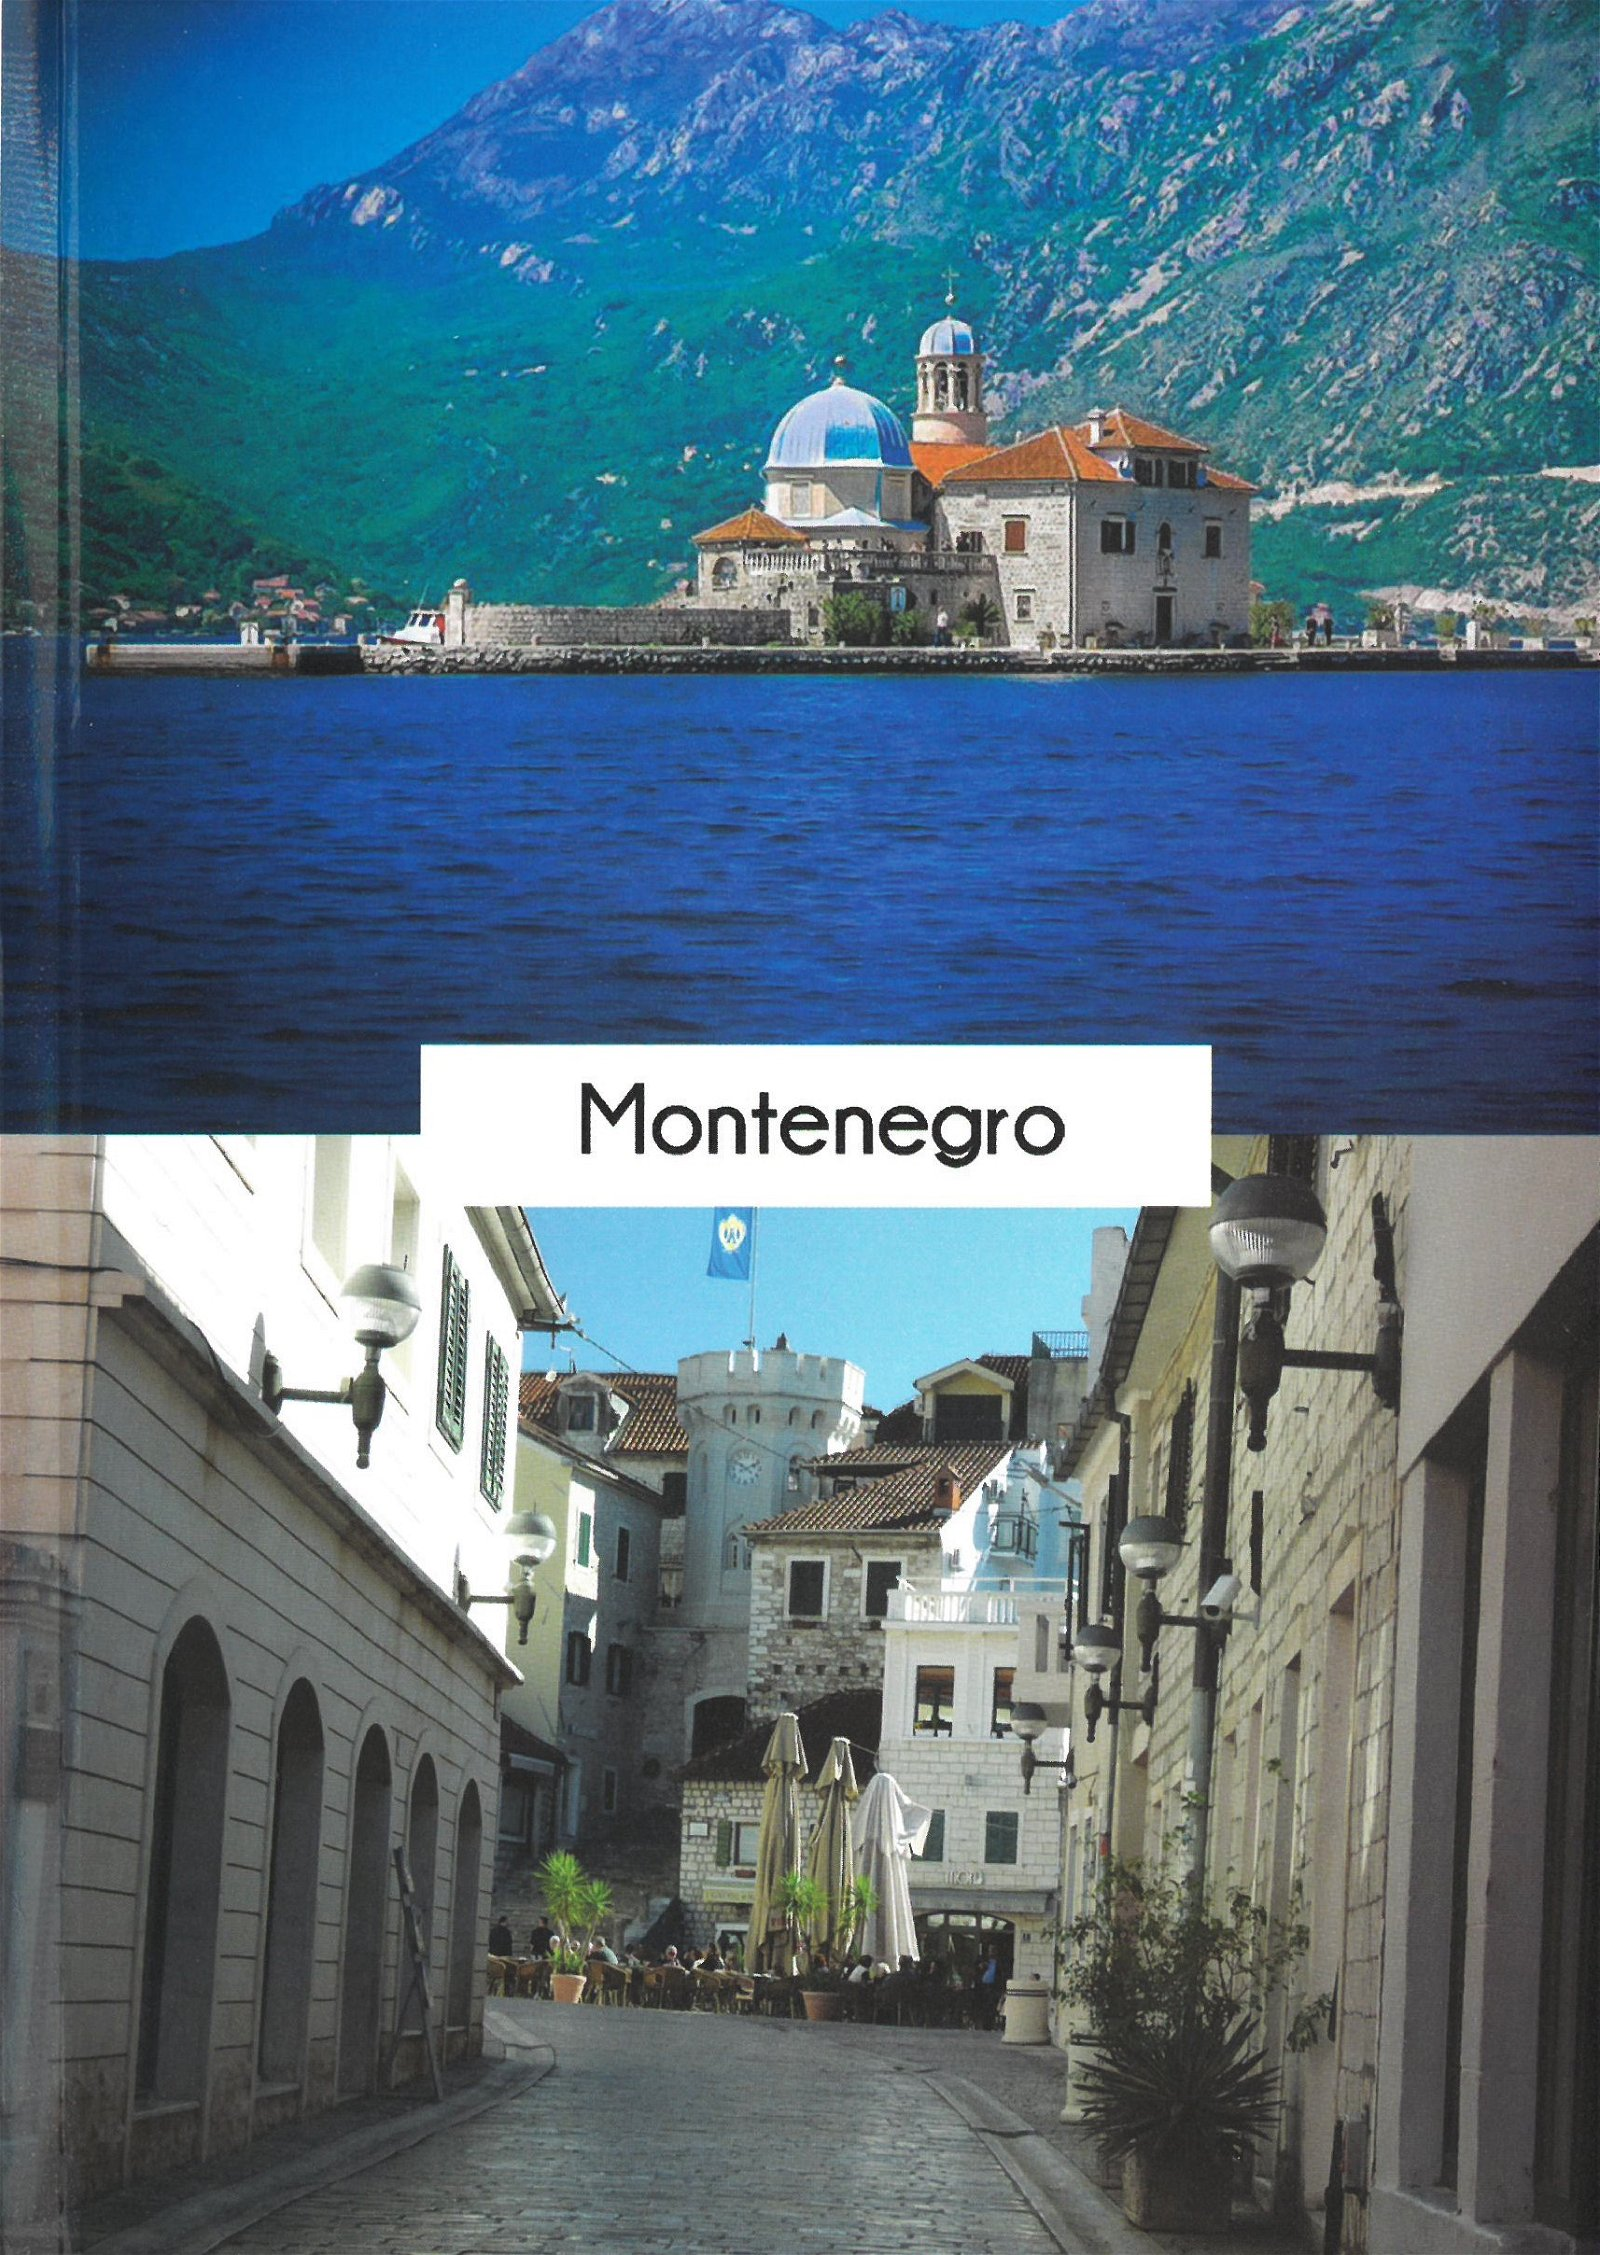 Montenegro 9789993826668 Jules Albrechts Jules Albrechts   Reisgidsen Servië, Bosnië-Hercegovina, Macedonië, Kosovo, Montenegro